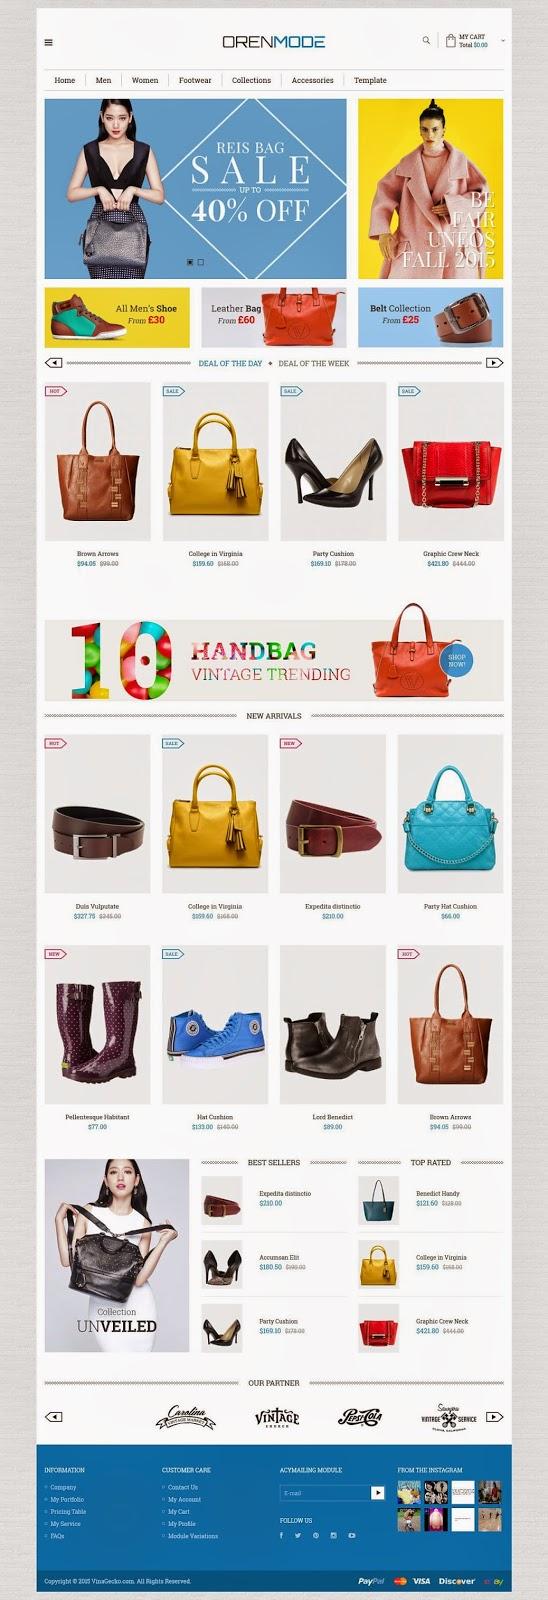 Free eCommerce Joomla Template 2015